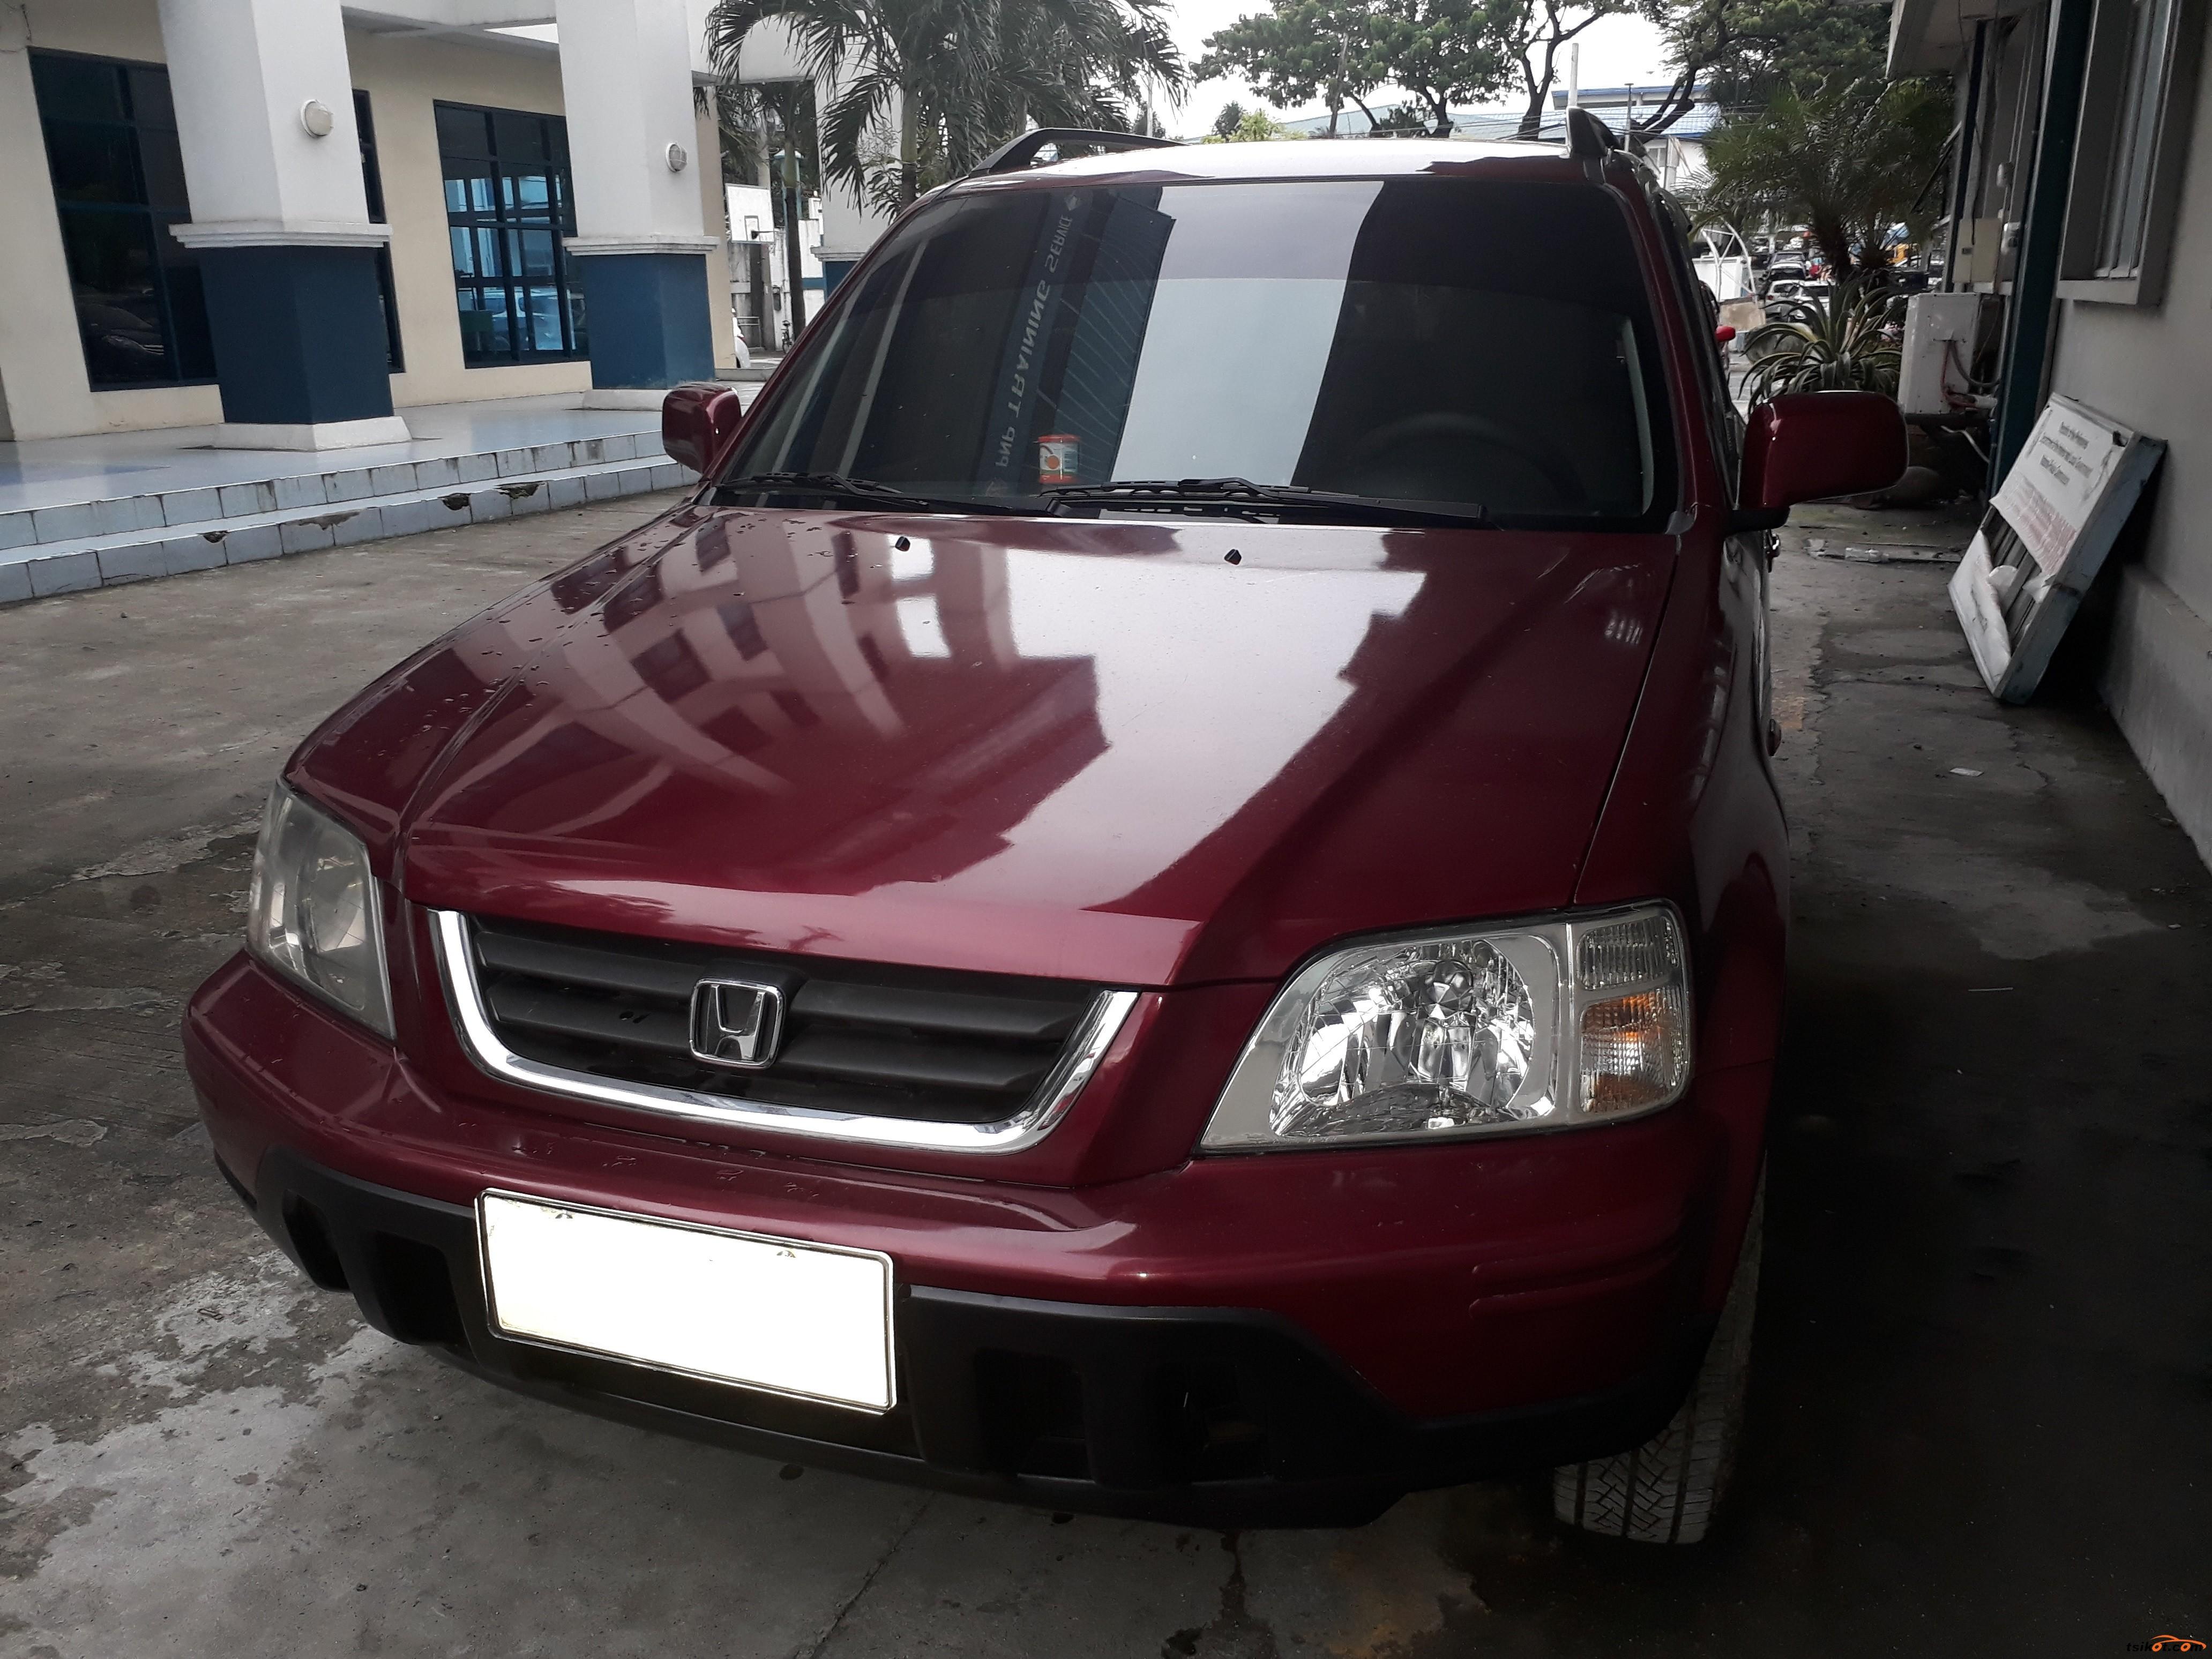 Honda Cr-V 1998 - Car for Sale Metro Manila